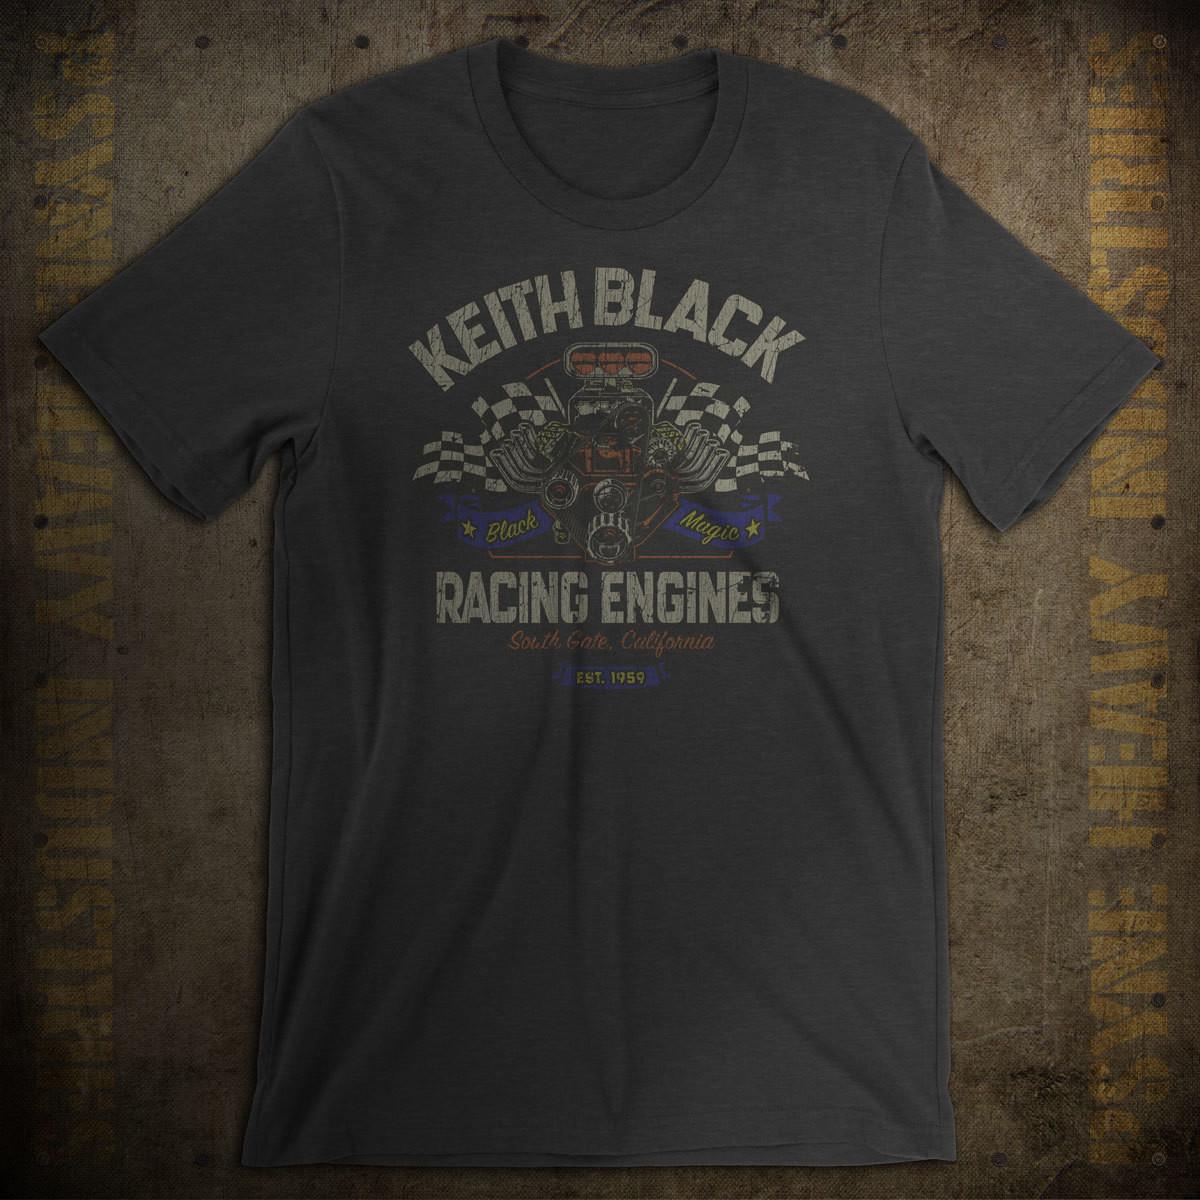 Keith Black Racing Engines Vintage T-Shirt